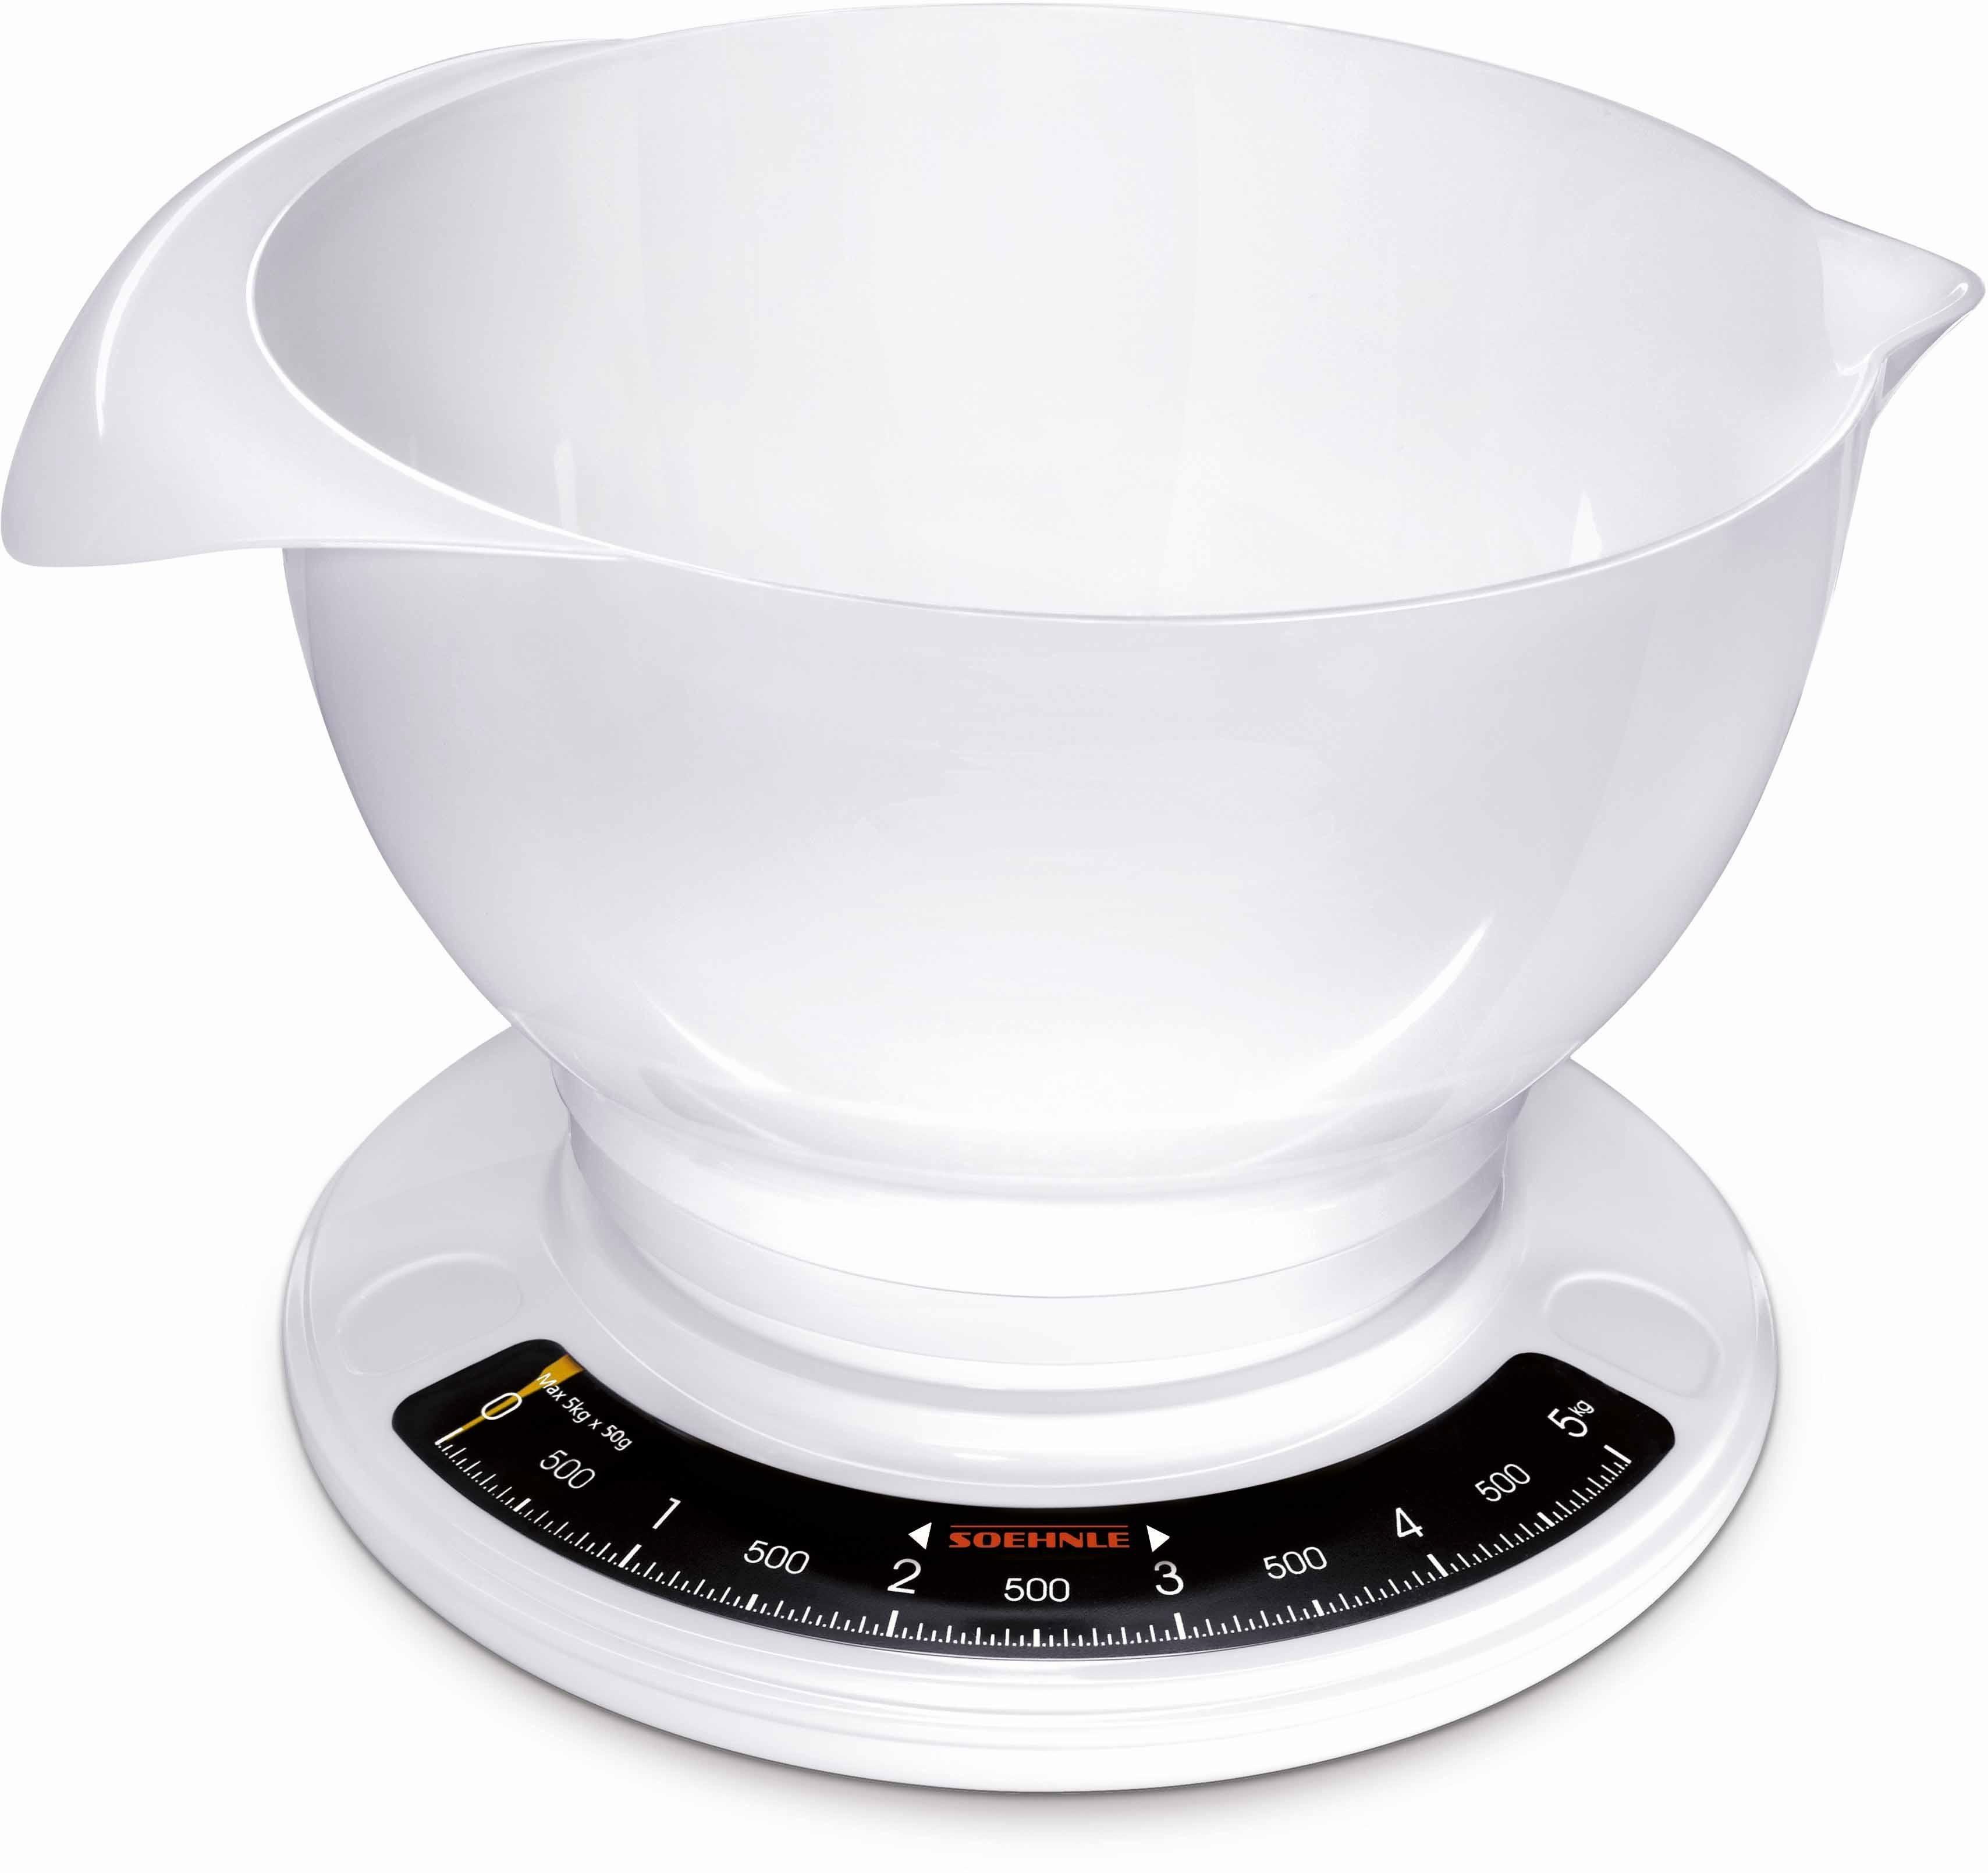 Soehnle Küchenwaage »Culina Pro«, mit großer Rührschüssel